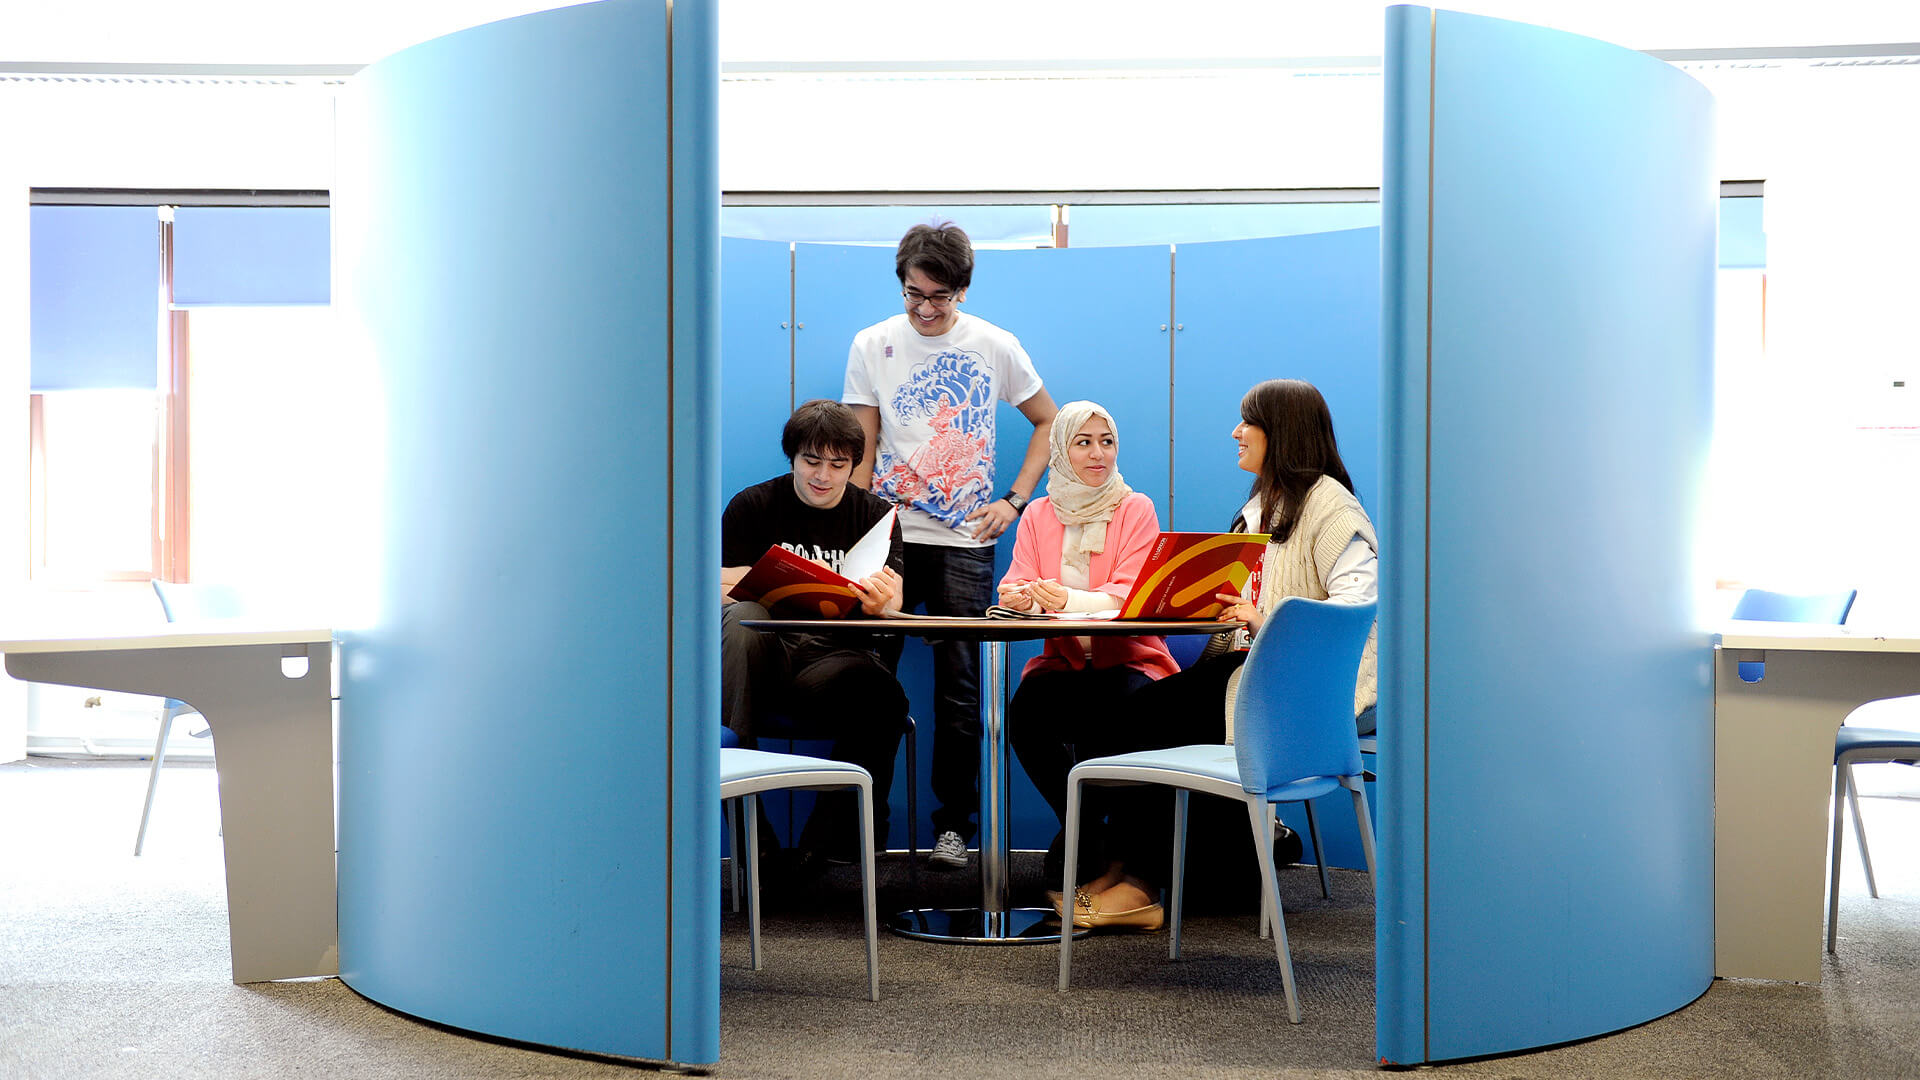 International students using study pods at City, University of London